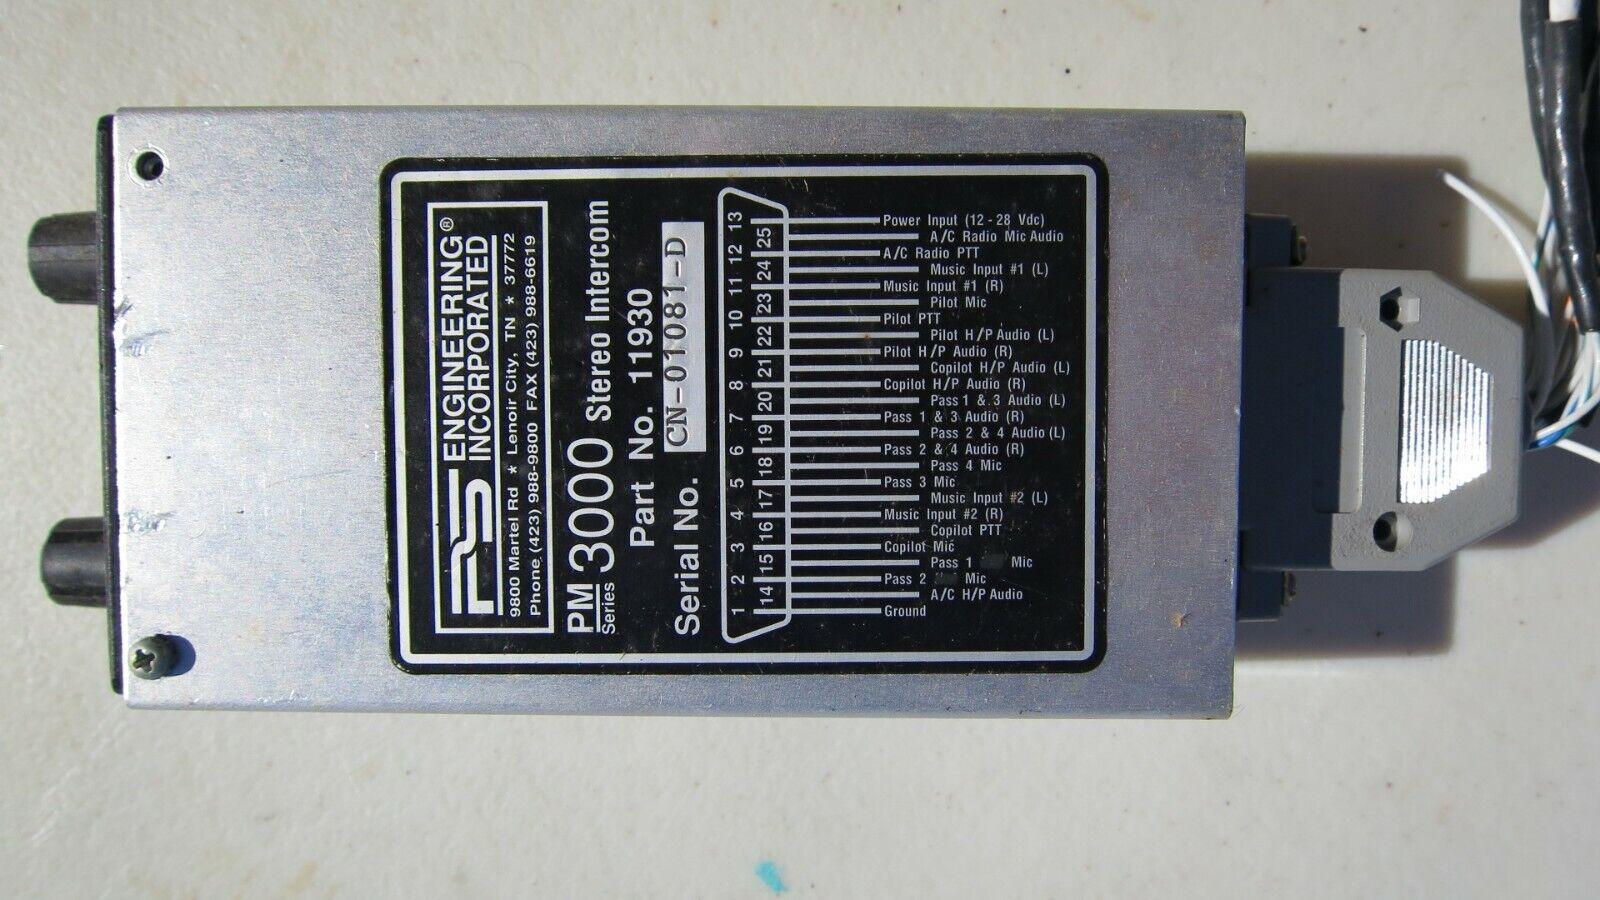 PS Engineering Inc. PM 3000 PM3000 Stereo Intercom P/N 11930